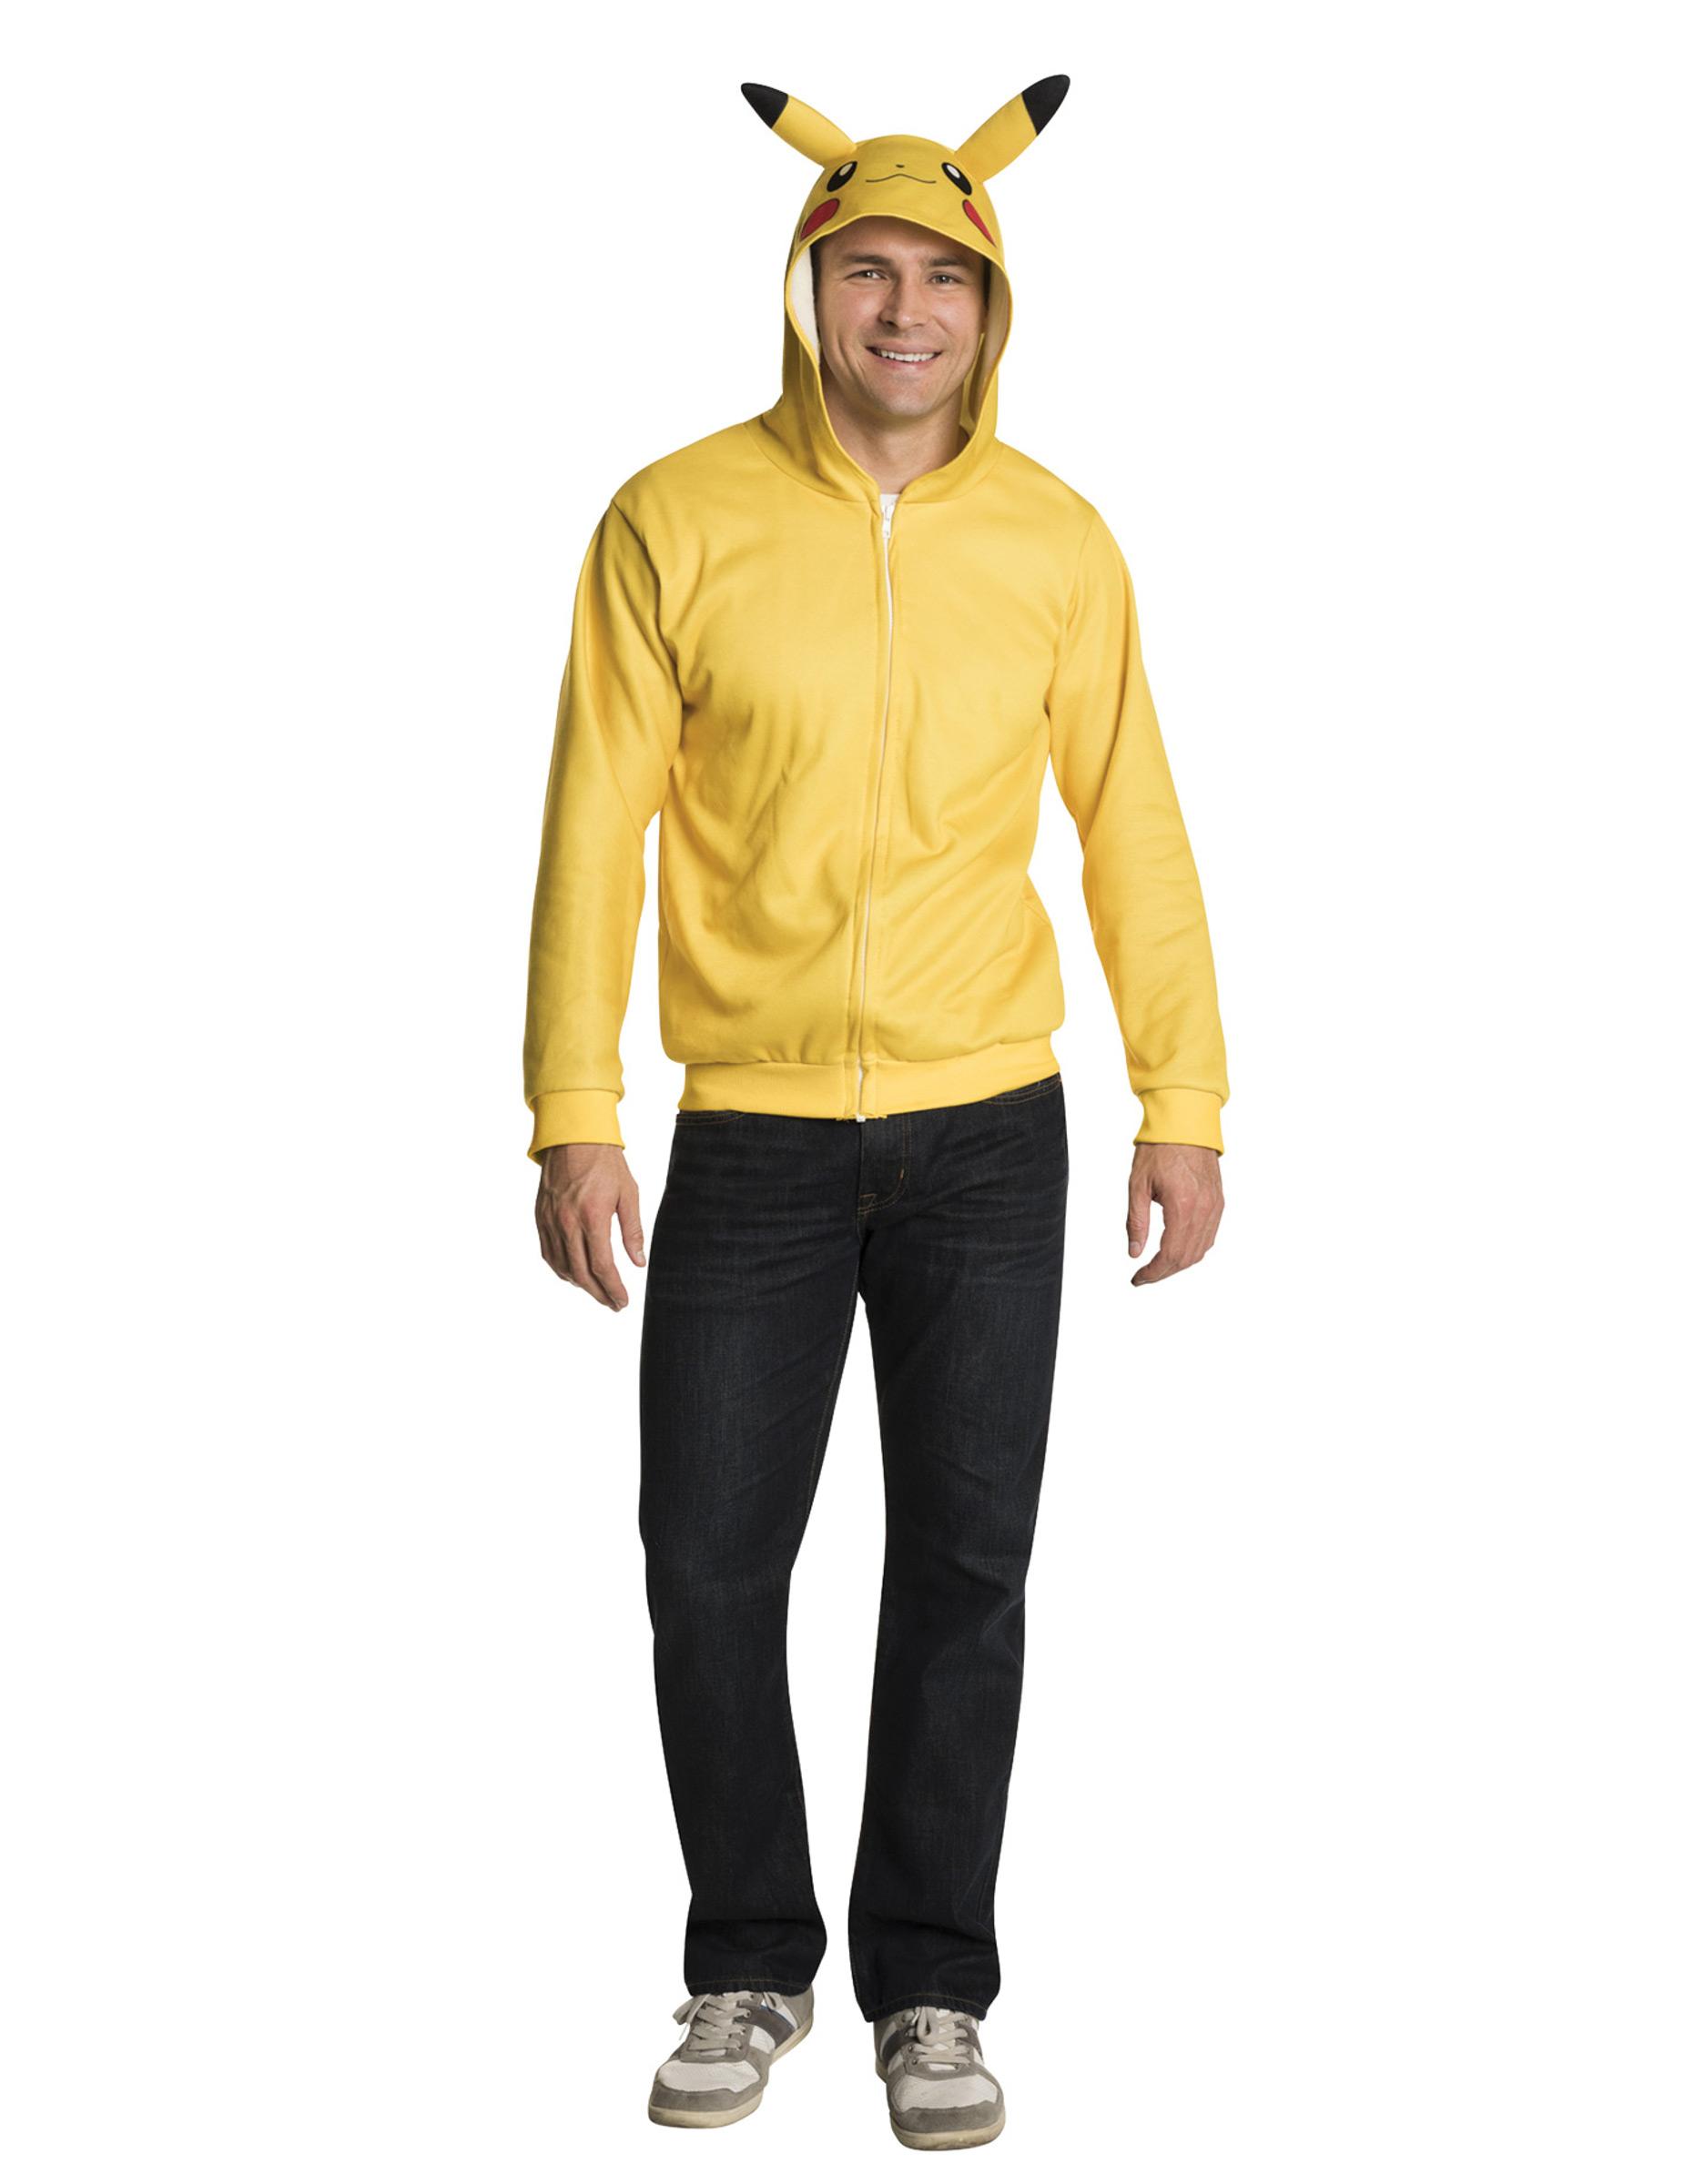 Disfraz Pikachu de Pokémon™ para hombre  Disfraces adultos 0400bdfd909